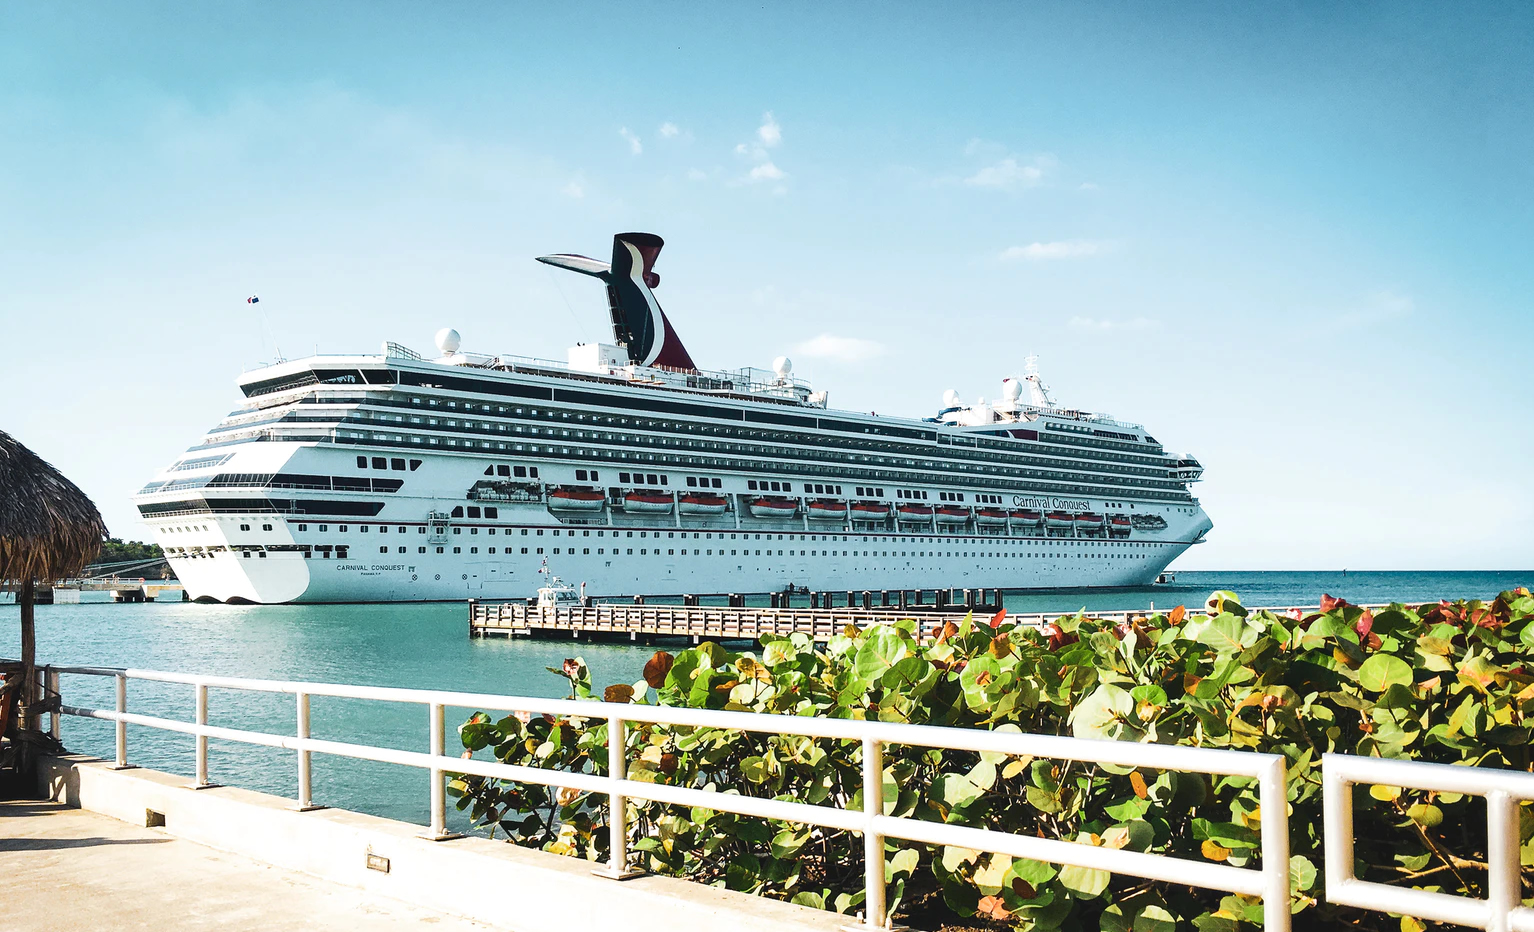 Florida to Sue the Federal Government, CDC Over COVID-19 Cruise Ship Ban